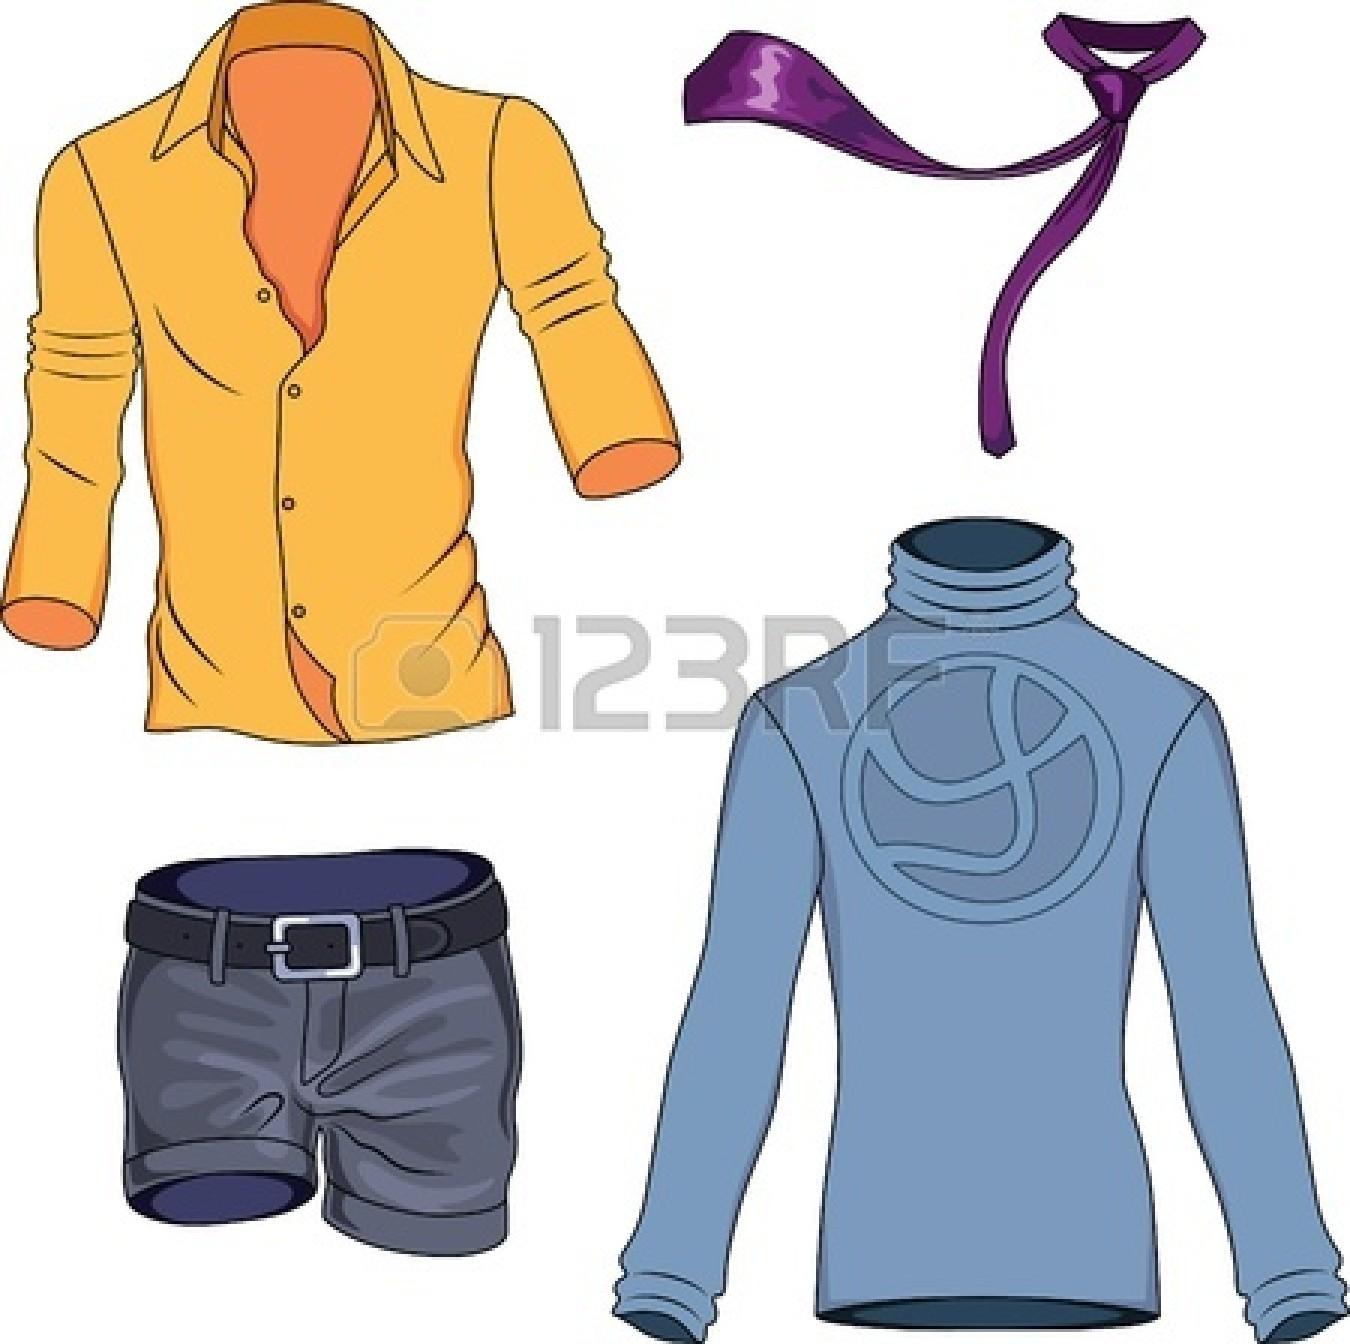 Men panda free images. Clothing clipart man clothes